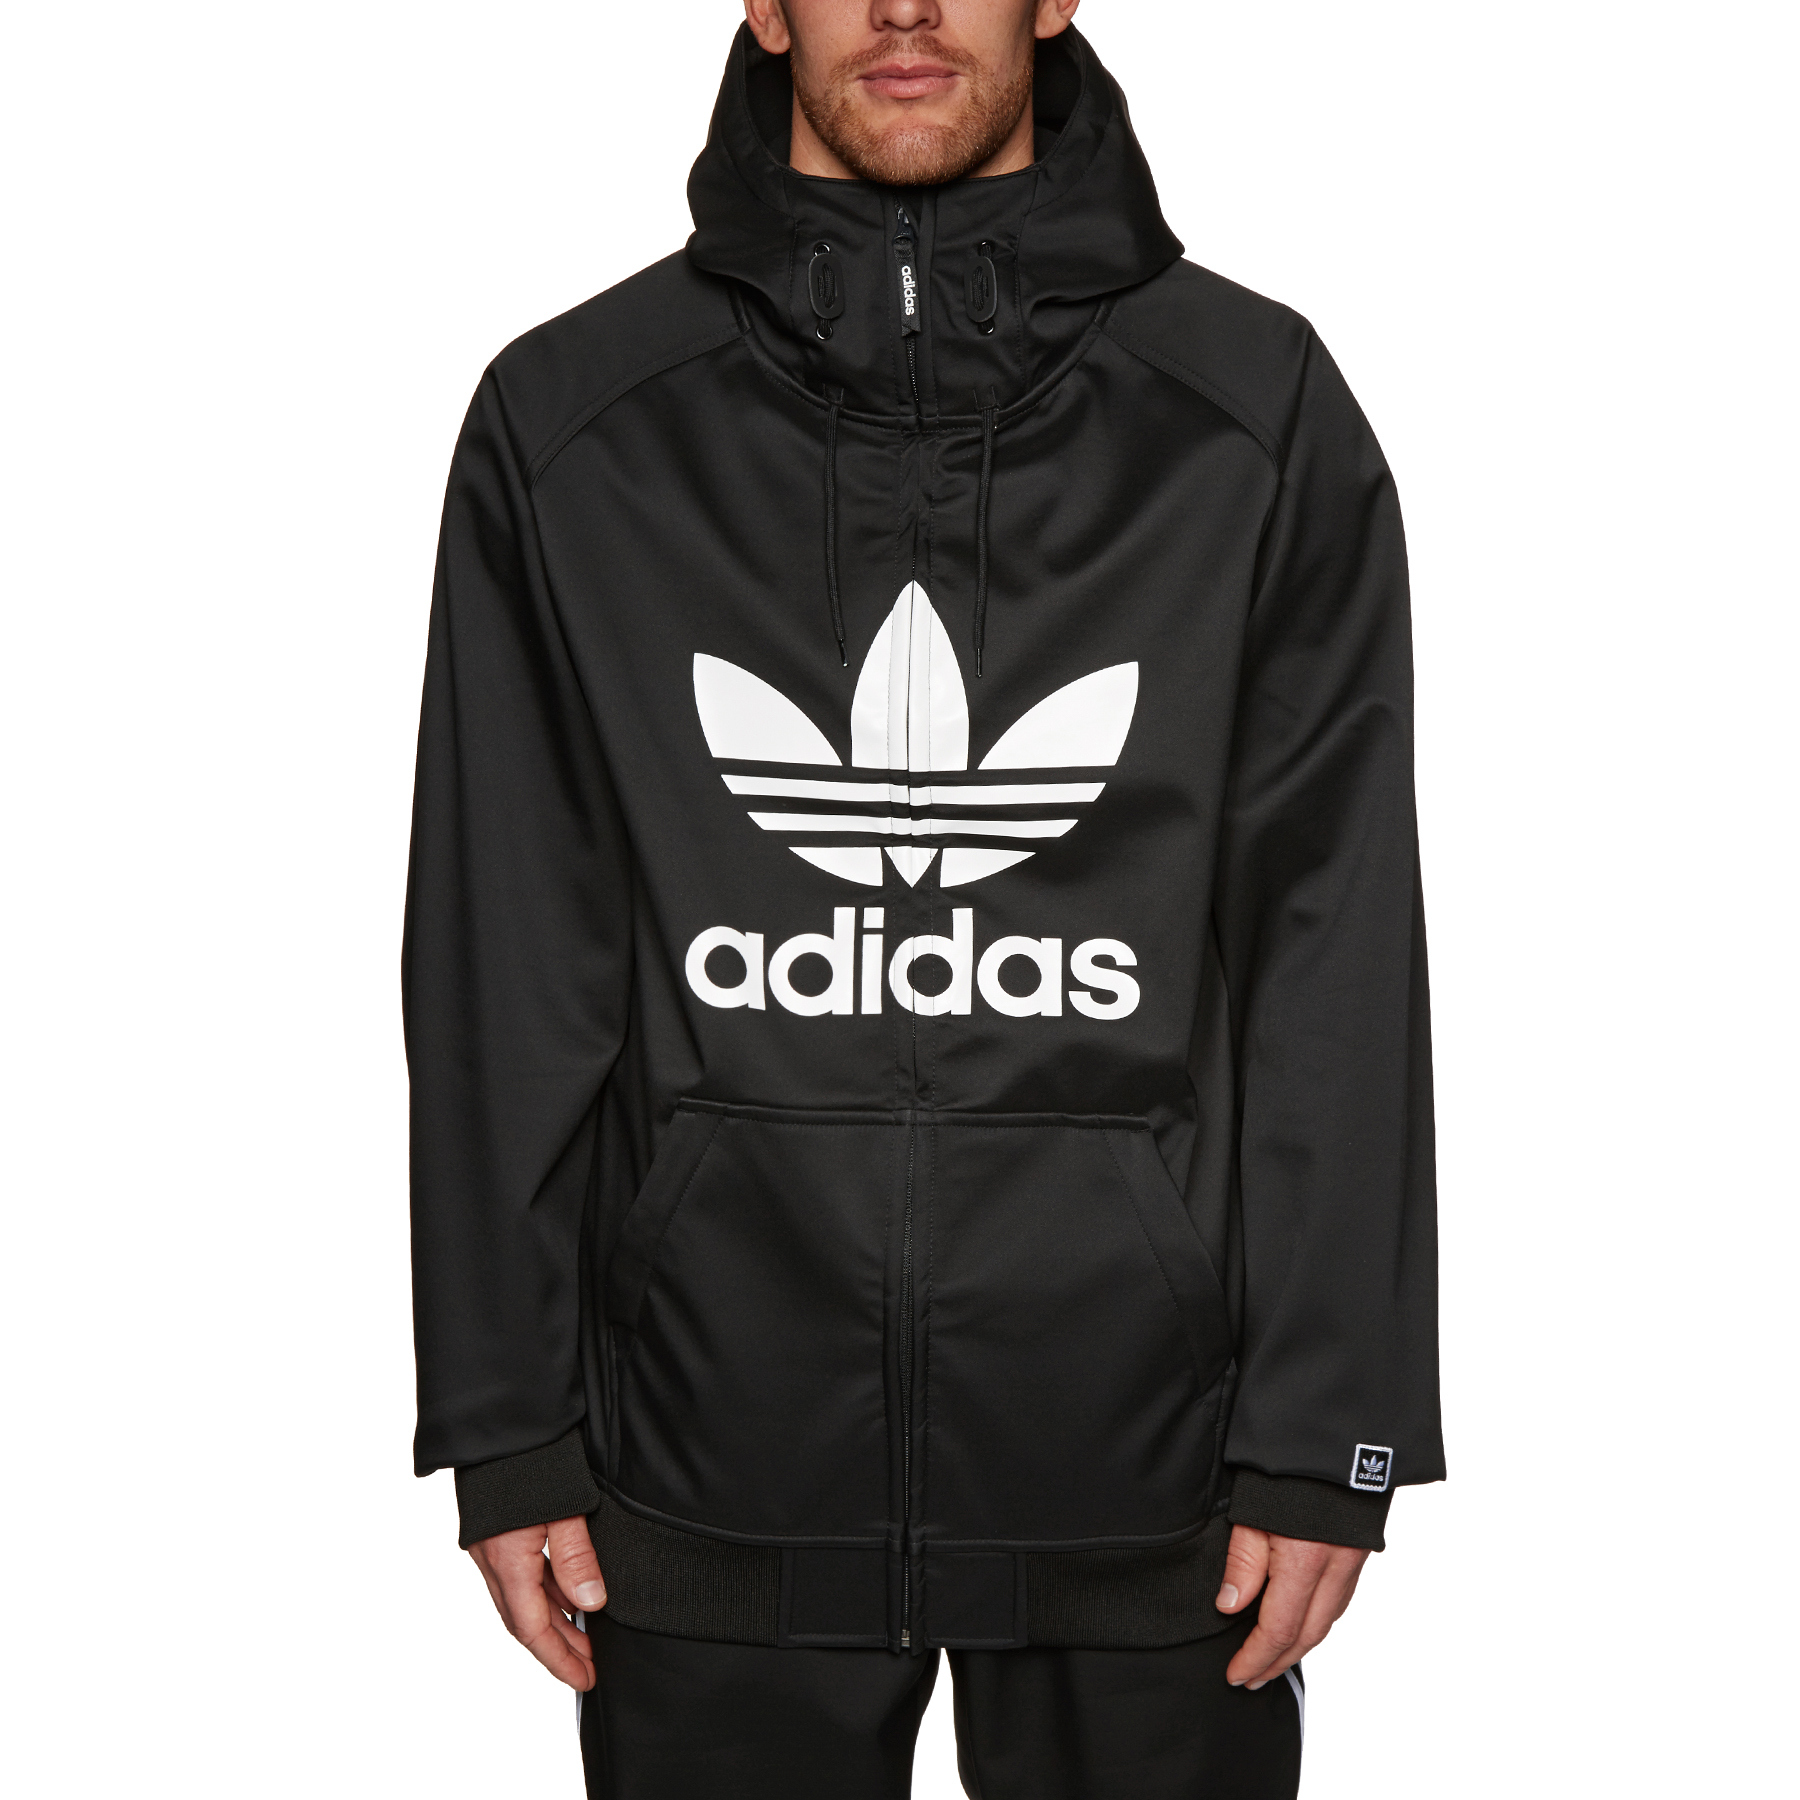 adidas Black white Greeley Softshell Snowboarding Jacket L